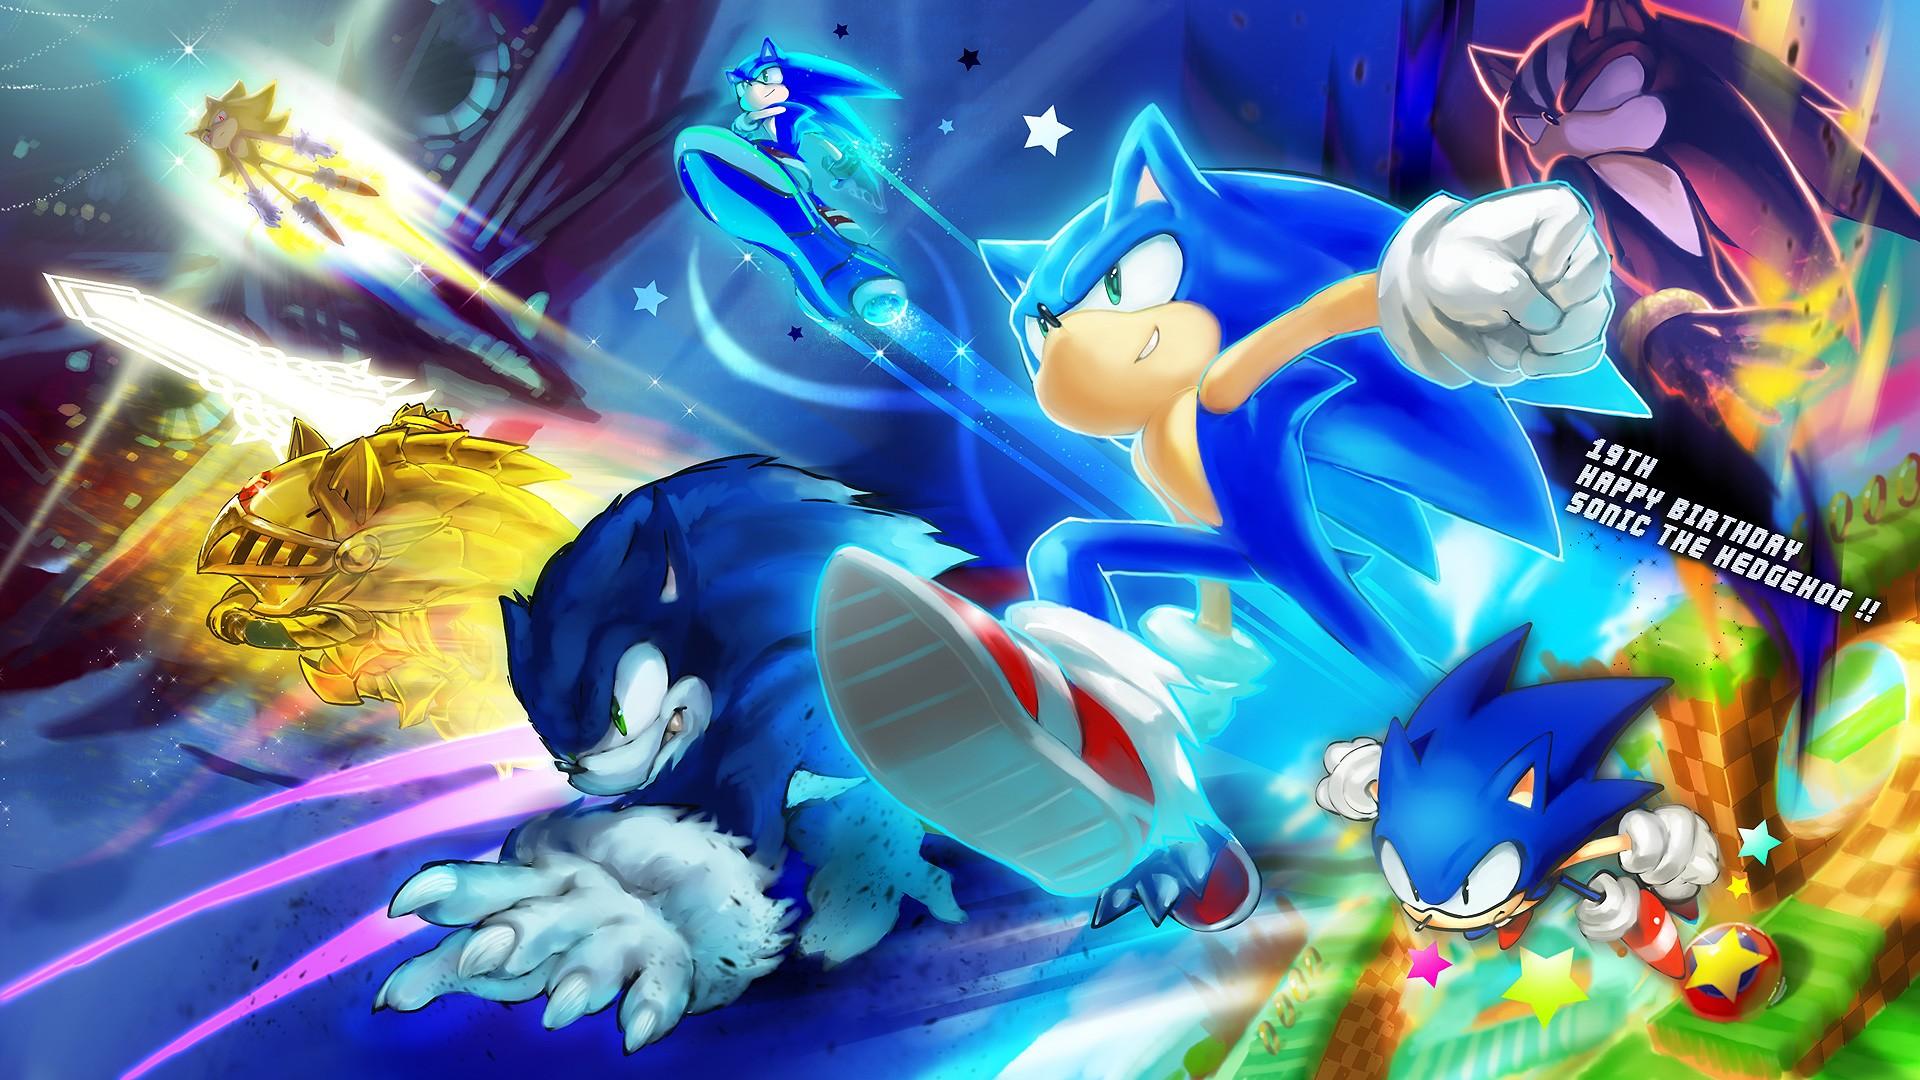 Free Fall Desktop Wallpaper Widescreen Free Sonic The Hedgehog Backgrounds Download Pixelstalk Net